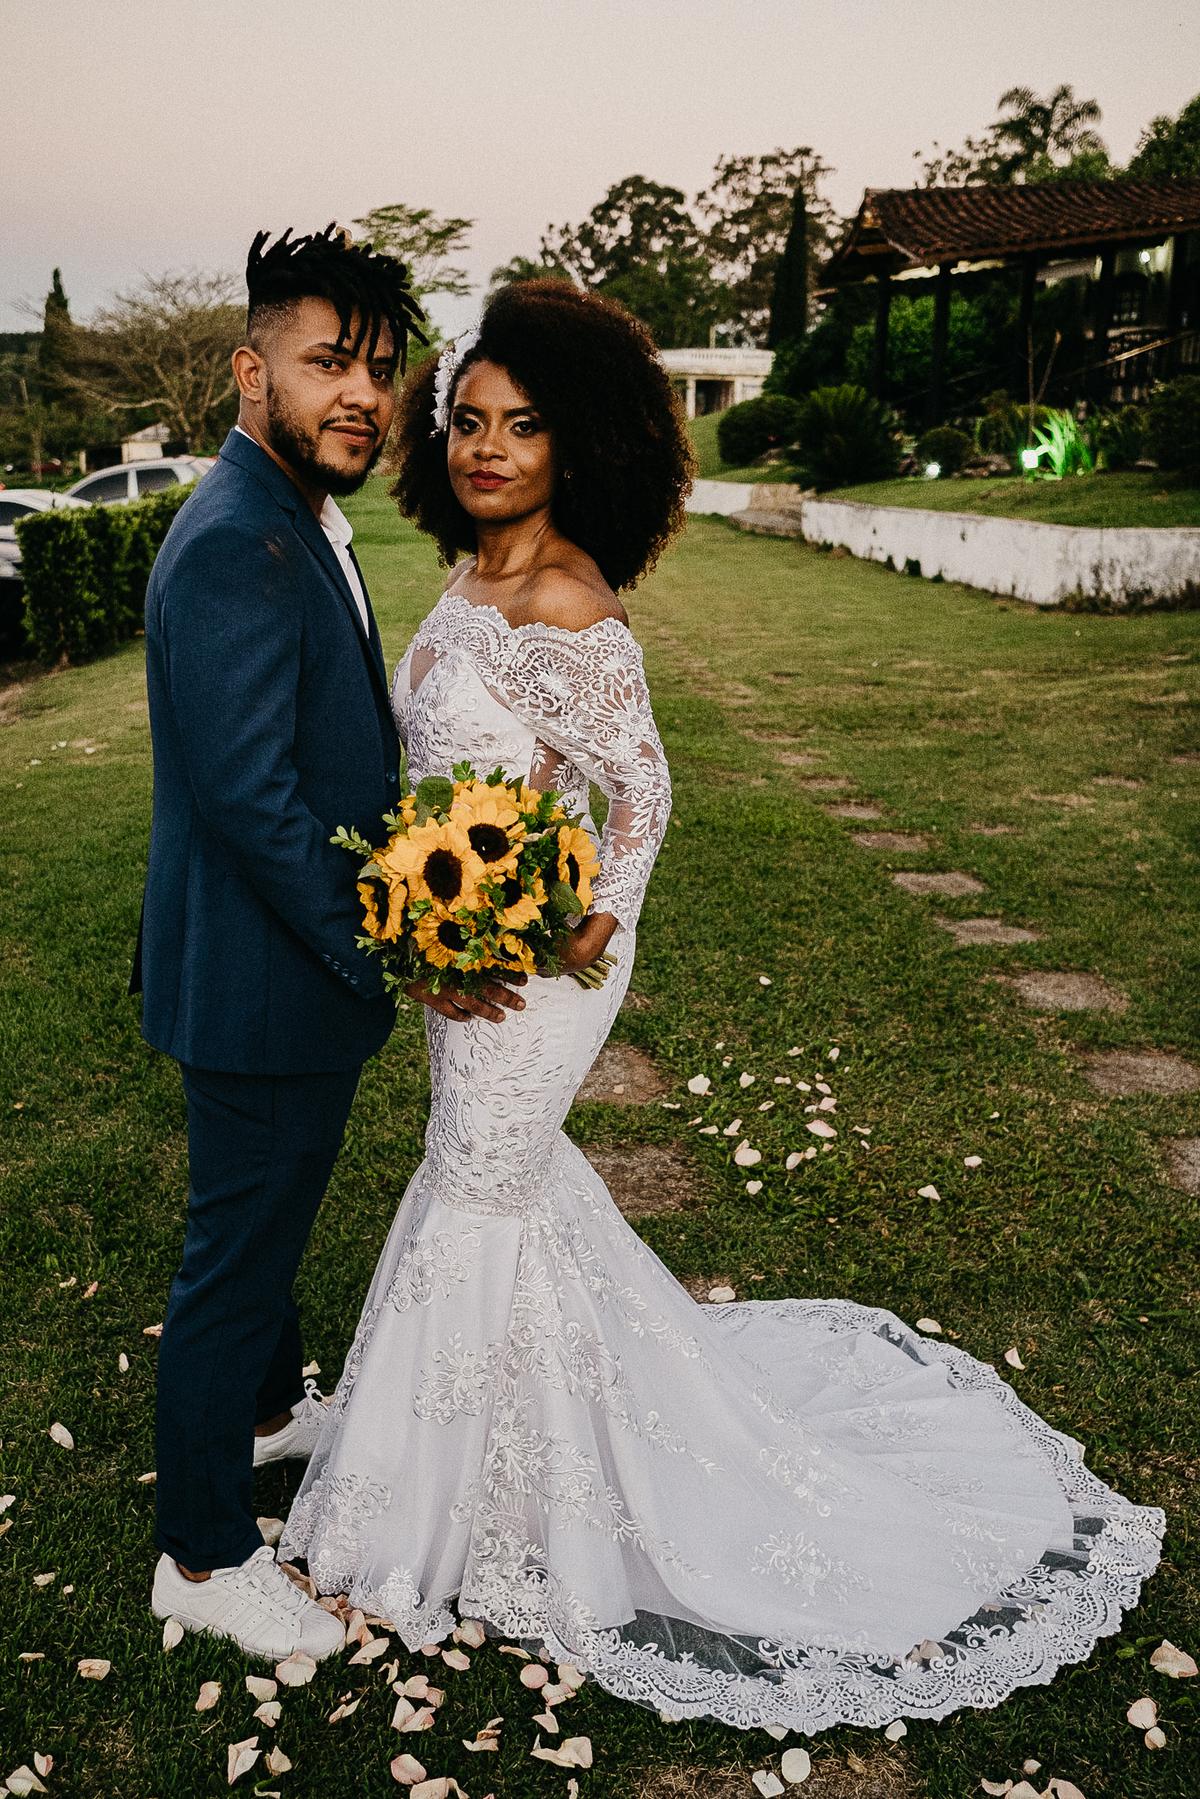 noivos sorrindo saida dos noivos cerimonia ao por do sol fotografia de casamento de dia fotografos de casamento em sao paulo noivos afros  retrato dos noivos ensaio casal